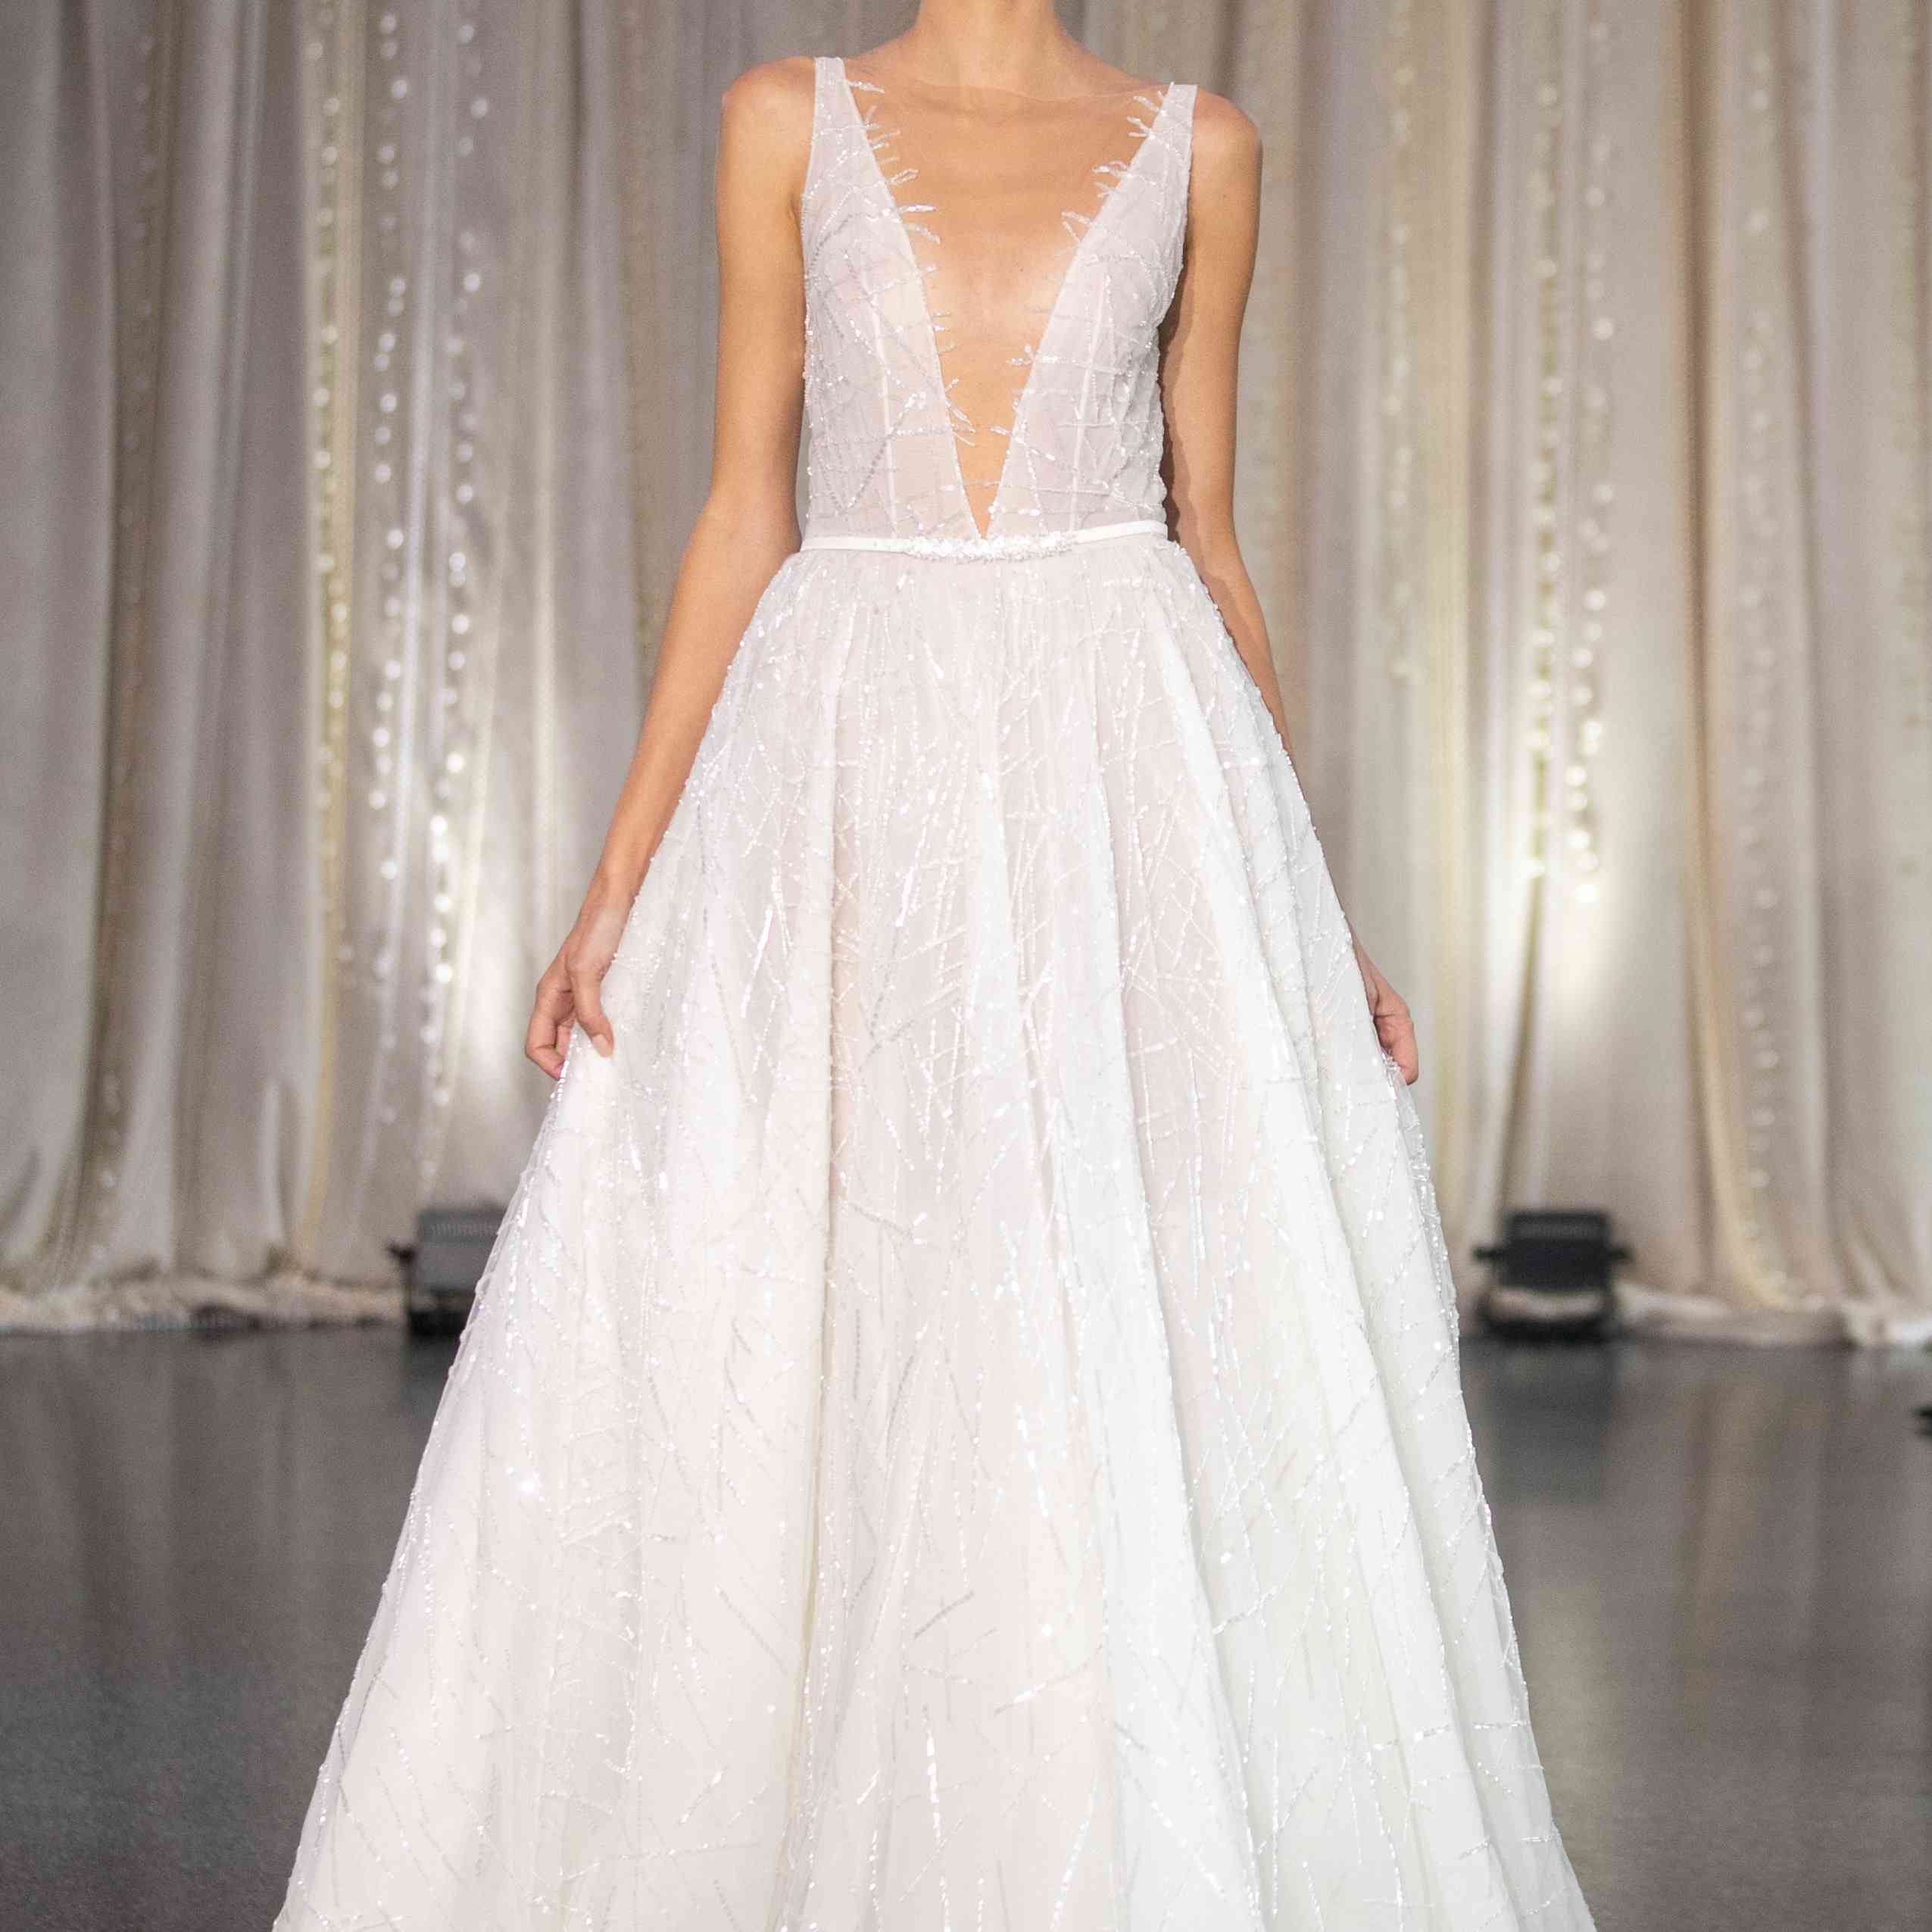 Model in sleeveless plunging wedding dress